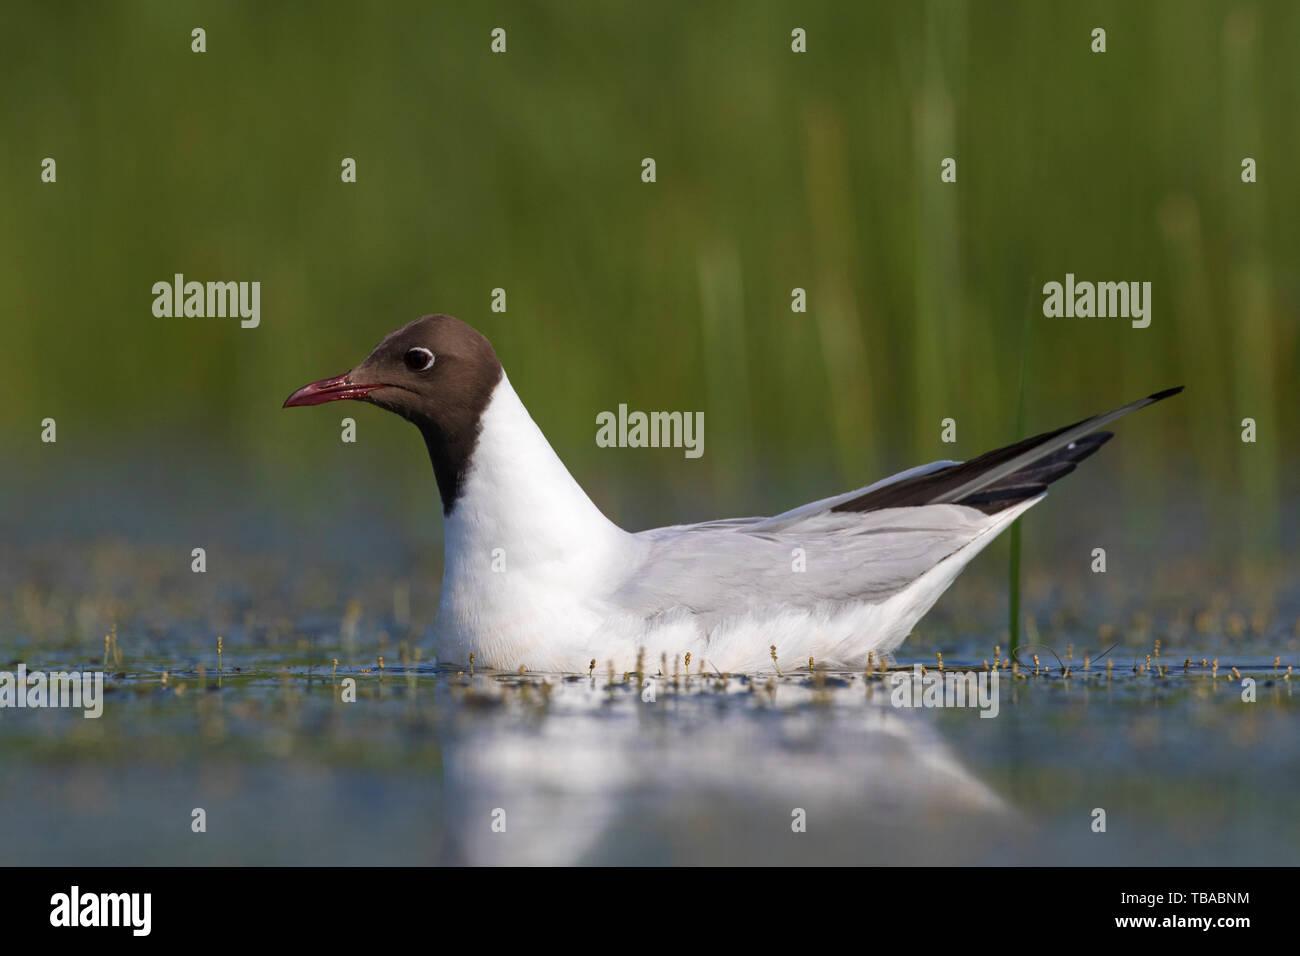 Black-headed gull (Chroicocephalus ridibundus / Larus ridibundus) in breeding plumage swimming in lake in wetland Stock Photo